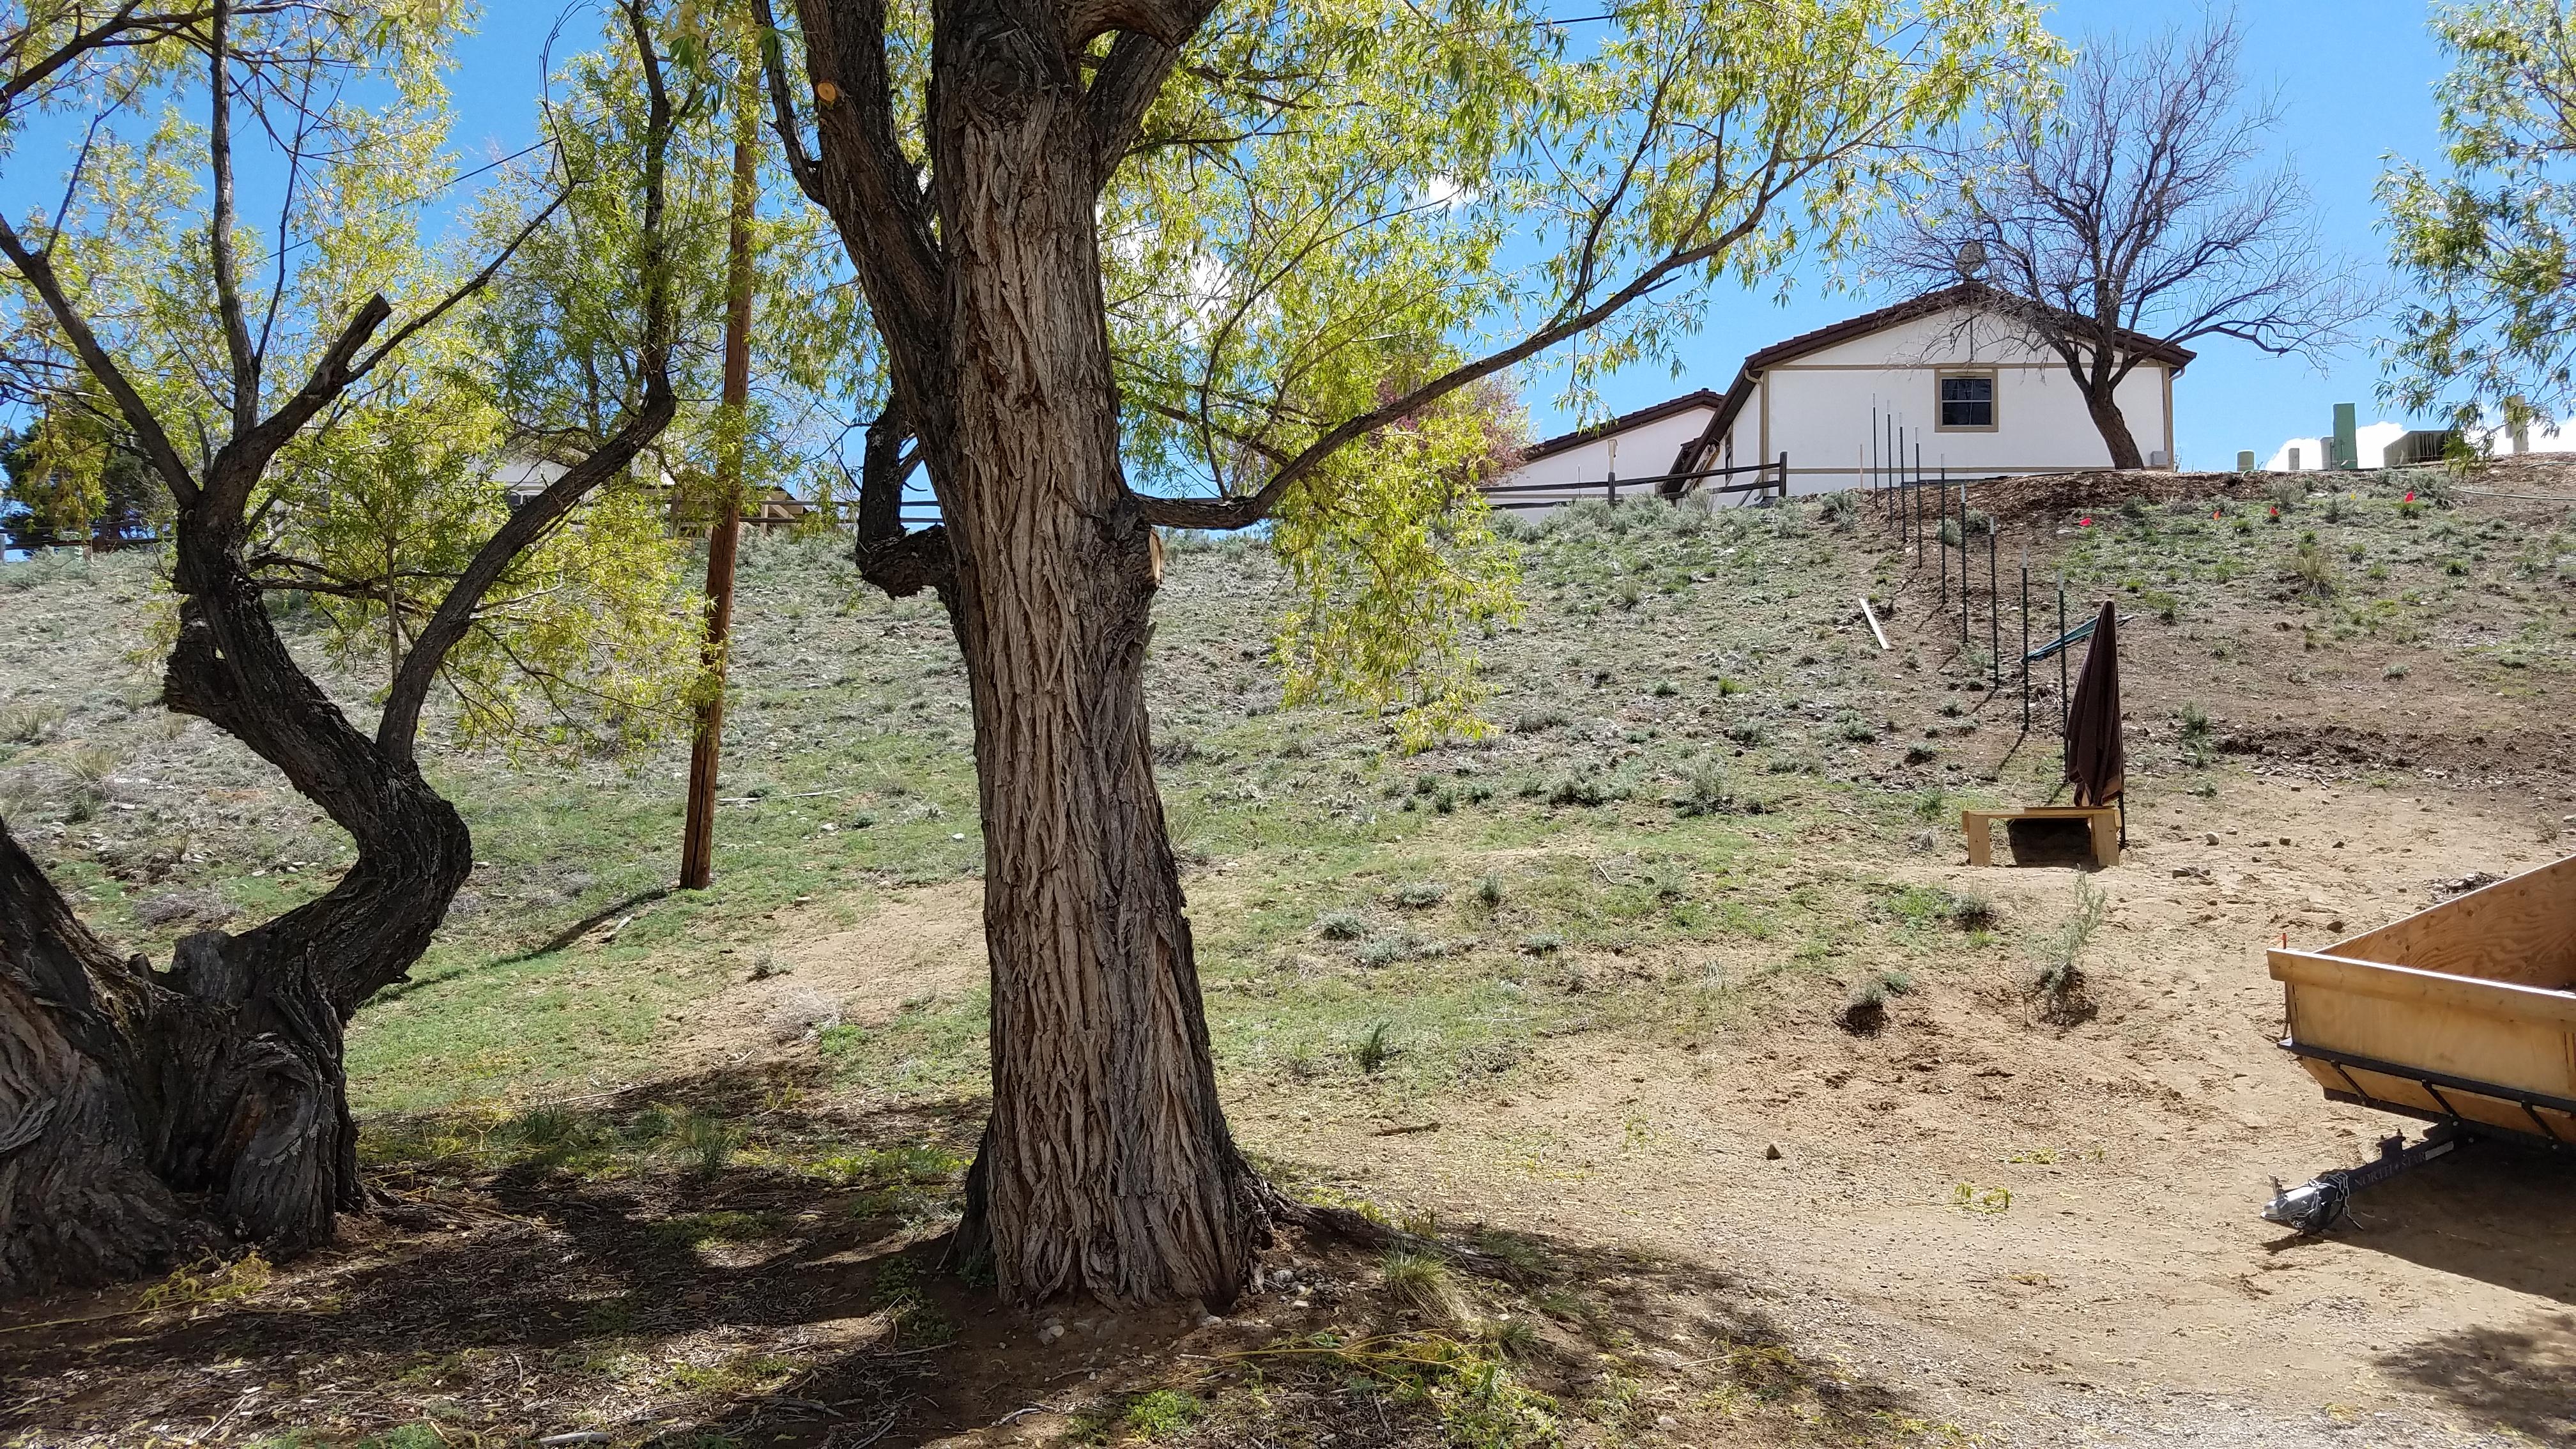 W Grand Ave, Salida, CO 81201, Salida, Colorado 81211